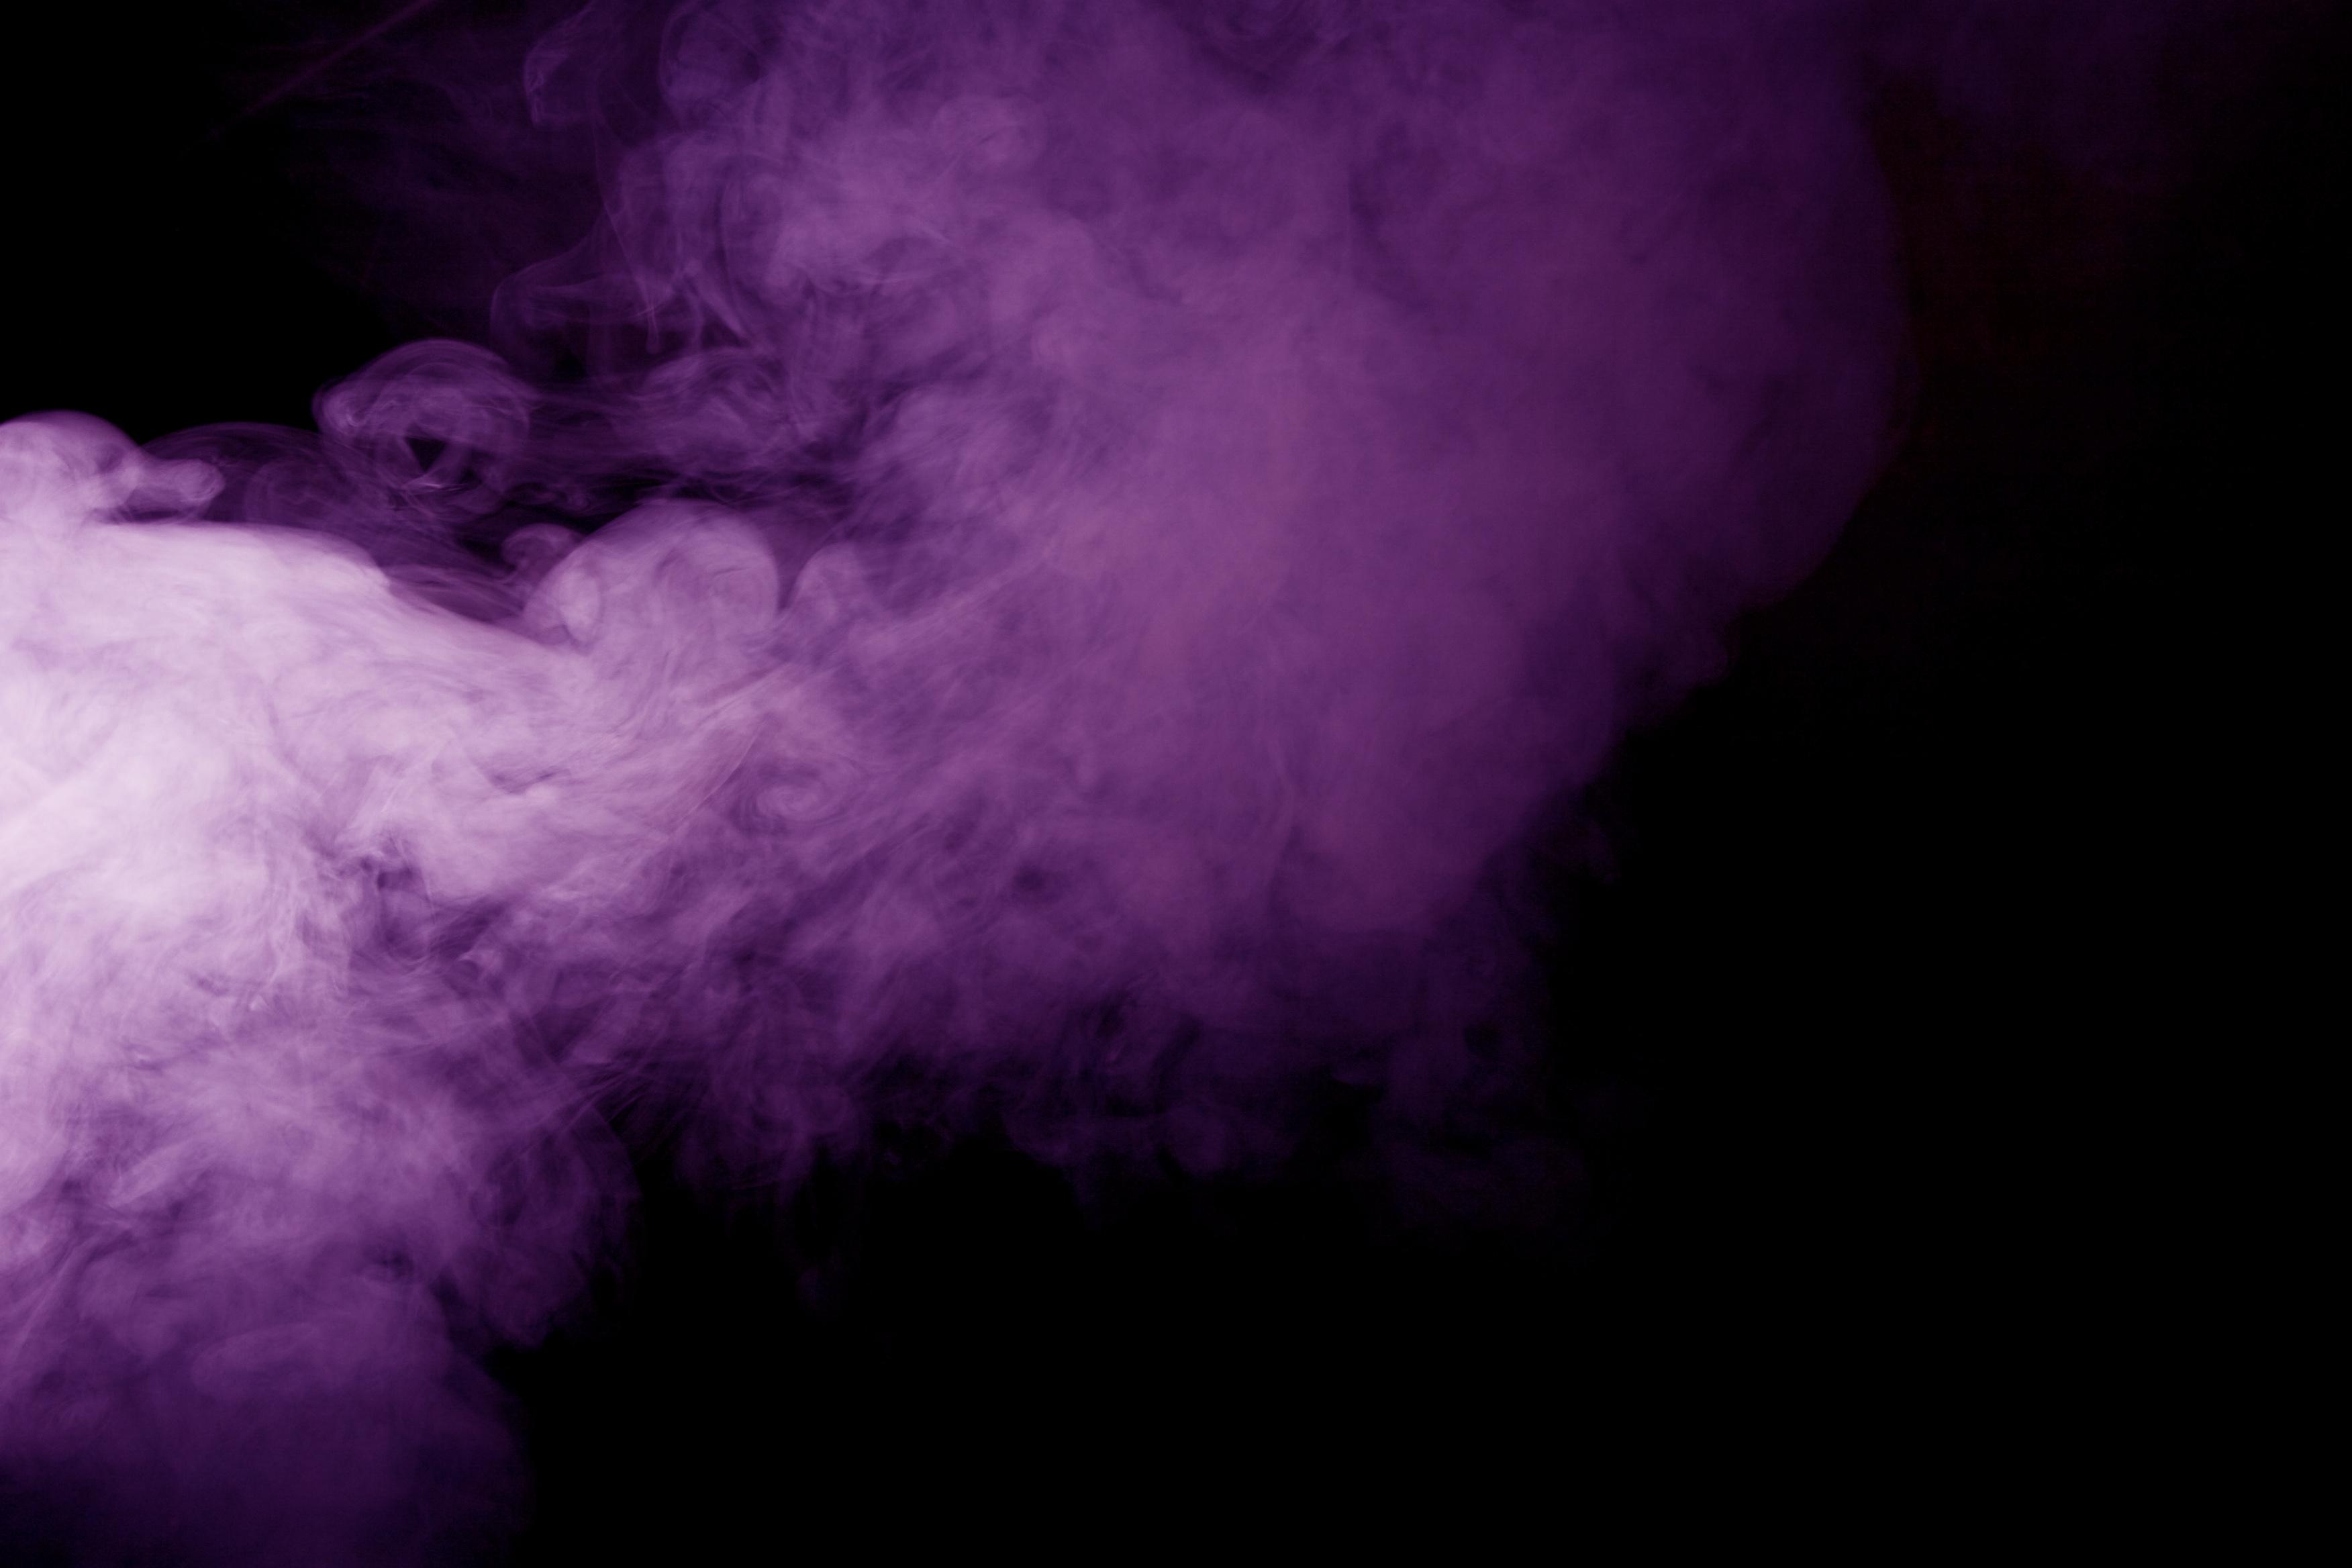 Fall Textured Wallpaper Free Photo Colored Smoke Purple Smoke